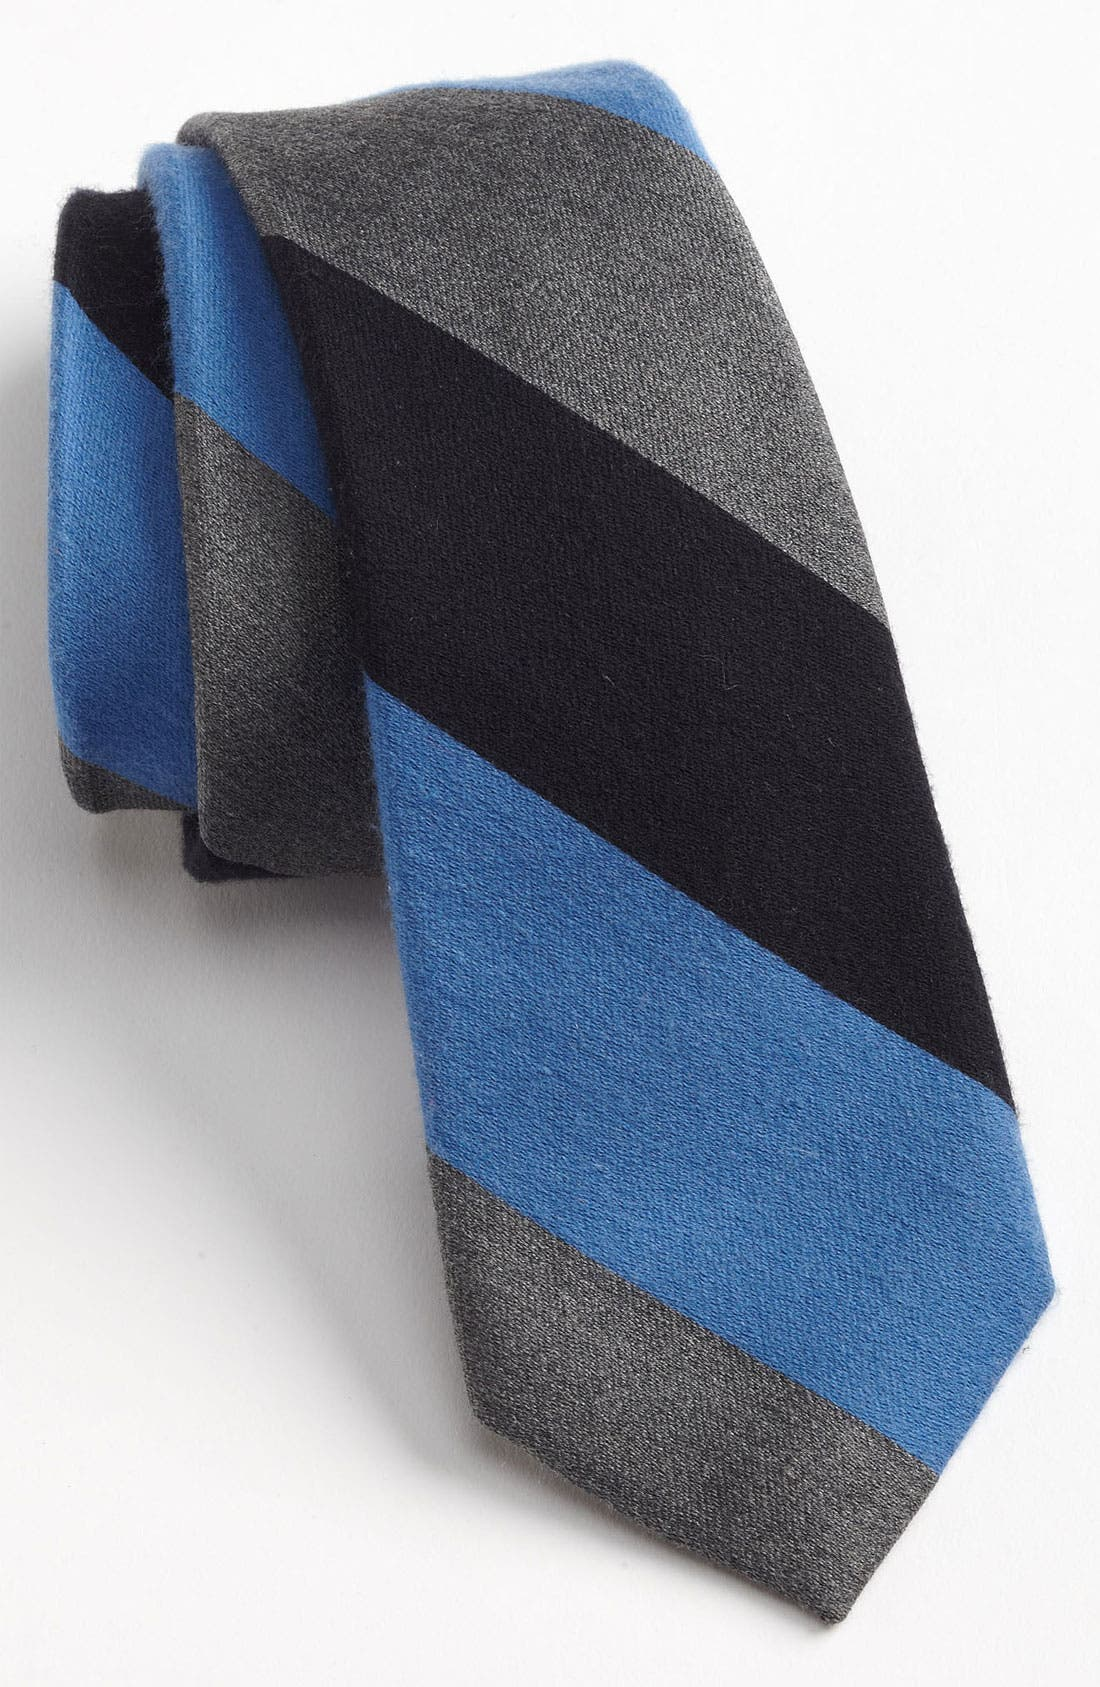 Main Image - 1901 Woven Tie